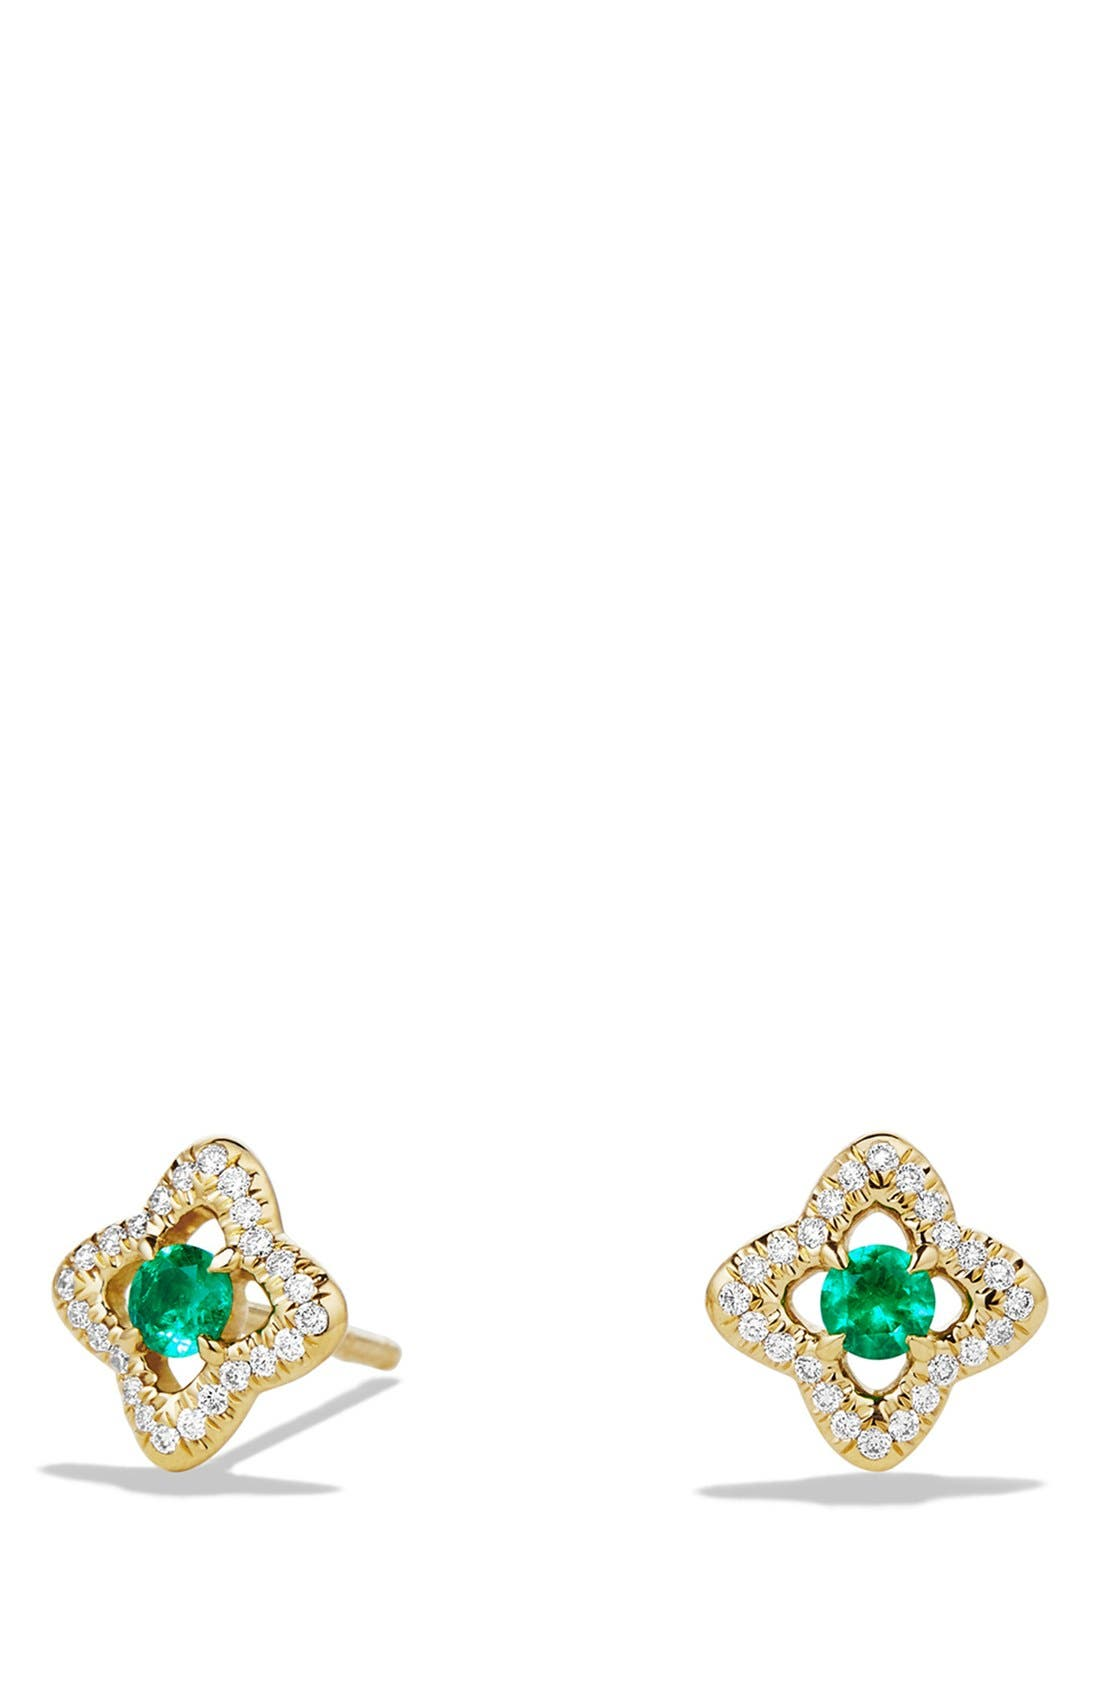 'Venetian Quatrefoil' Earrings with Precious Stones and Diamonds in 18K Gold,                             Main thumbnail 1, color,                             EMERALD